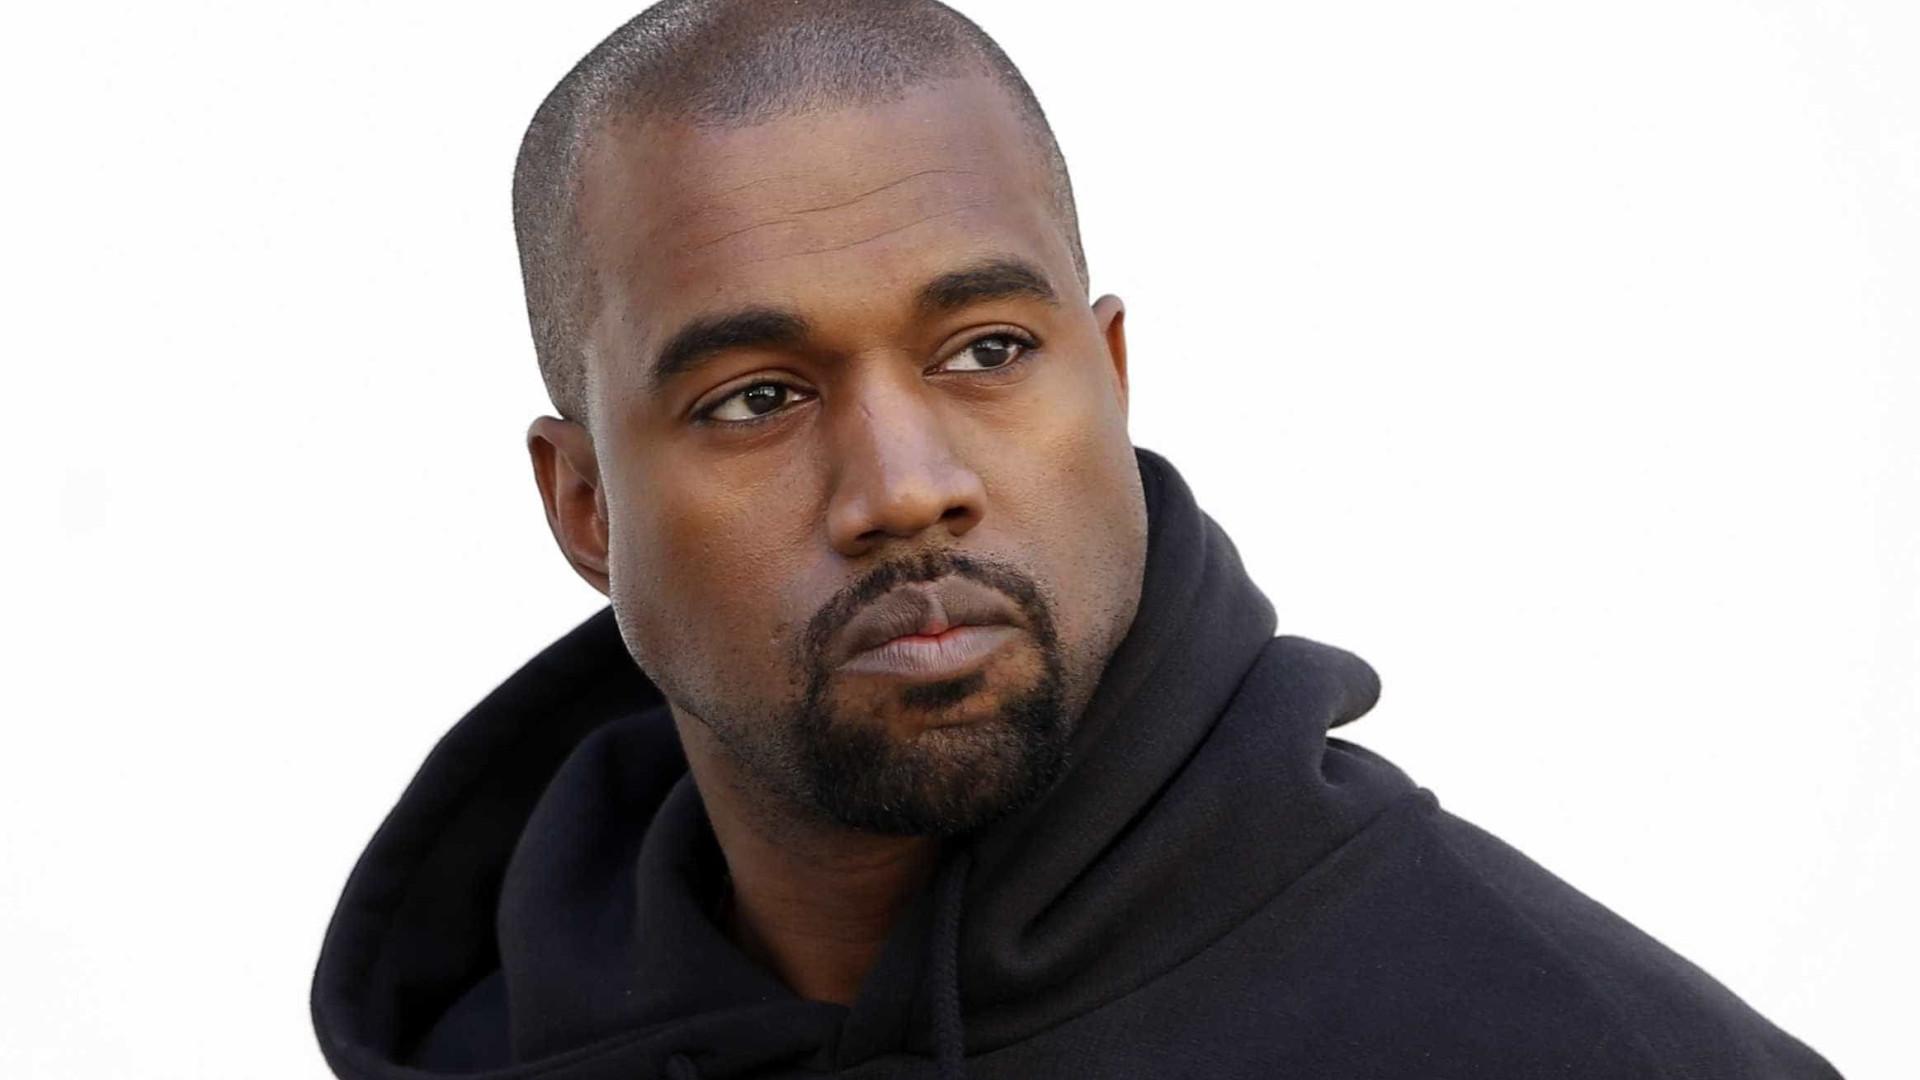 Kanye West interpreta tema de Backstreet Boys com Mark Zuckerberg